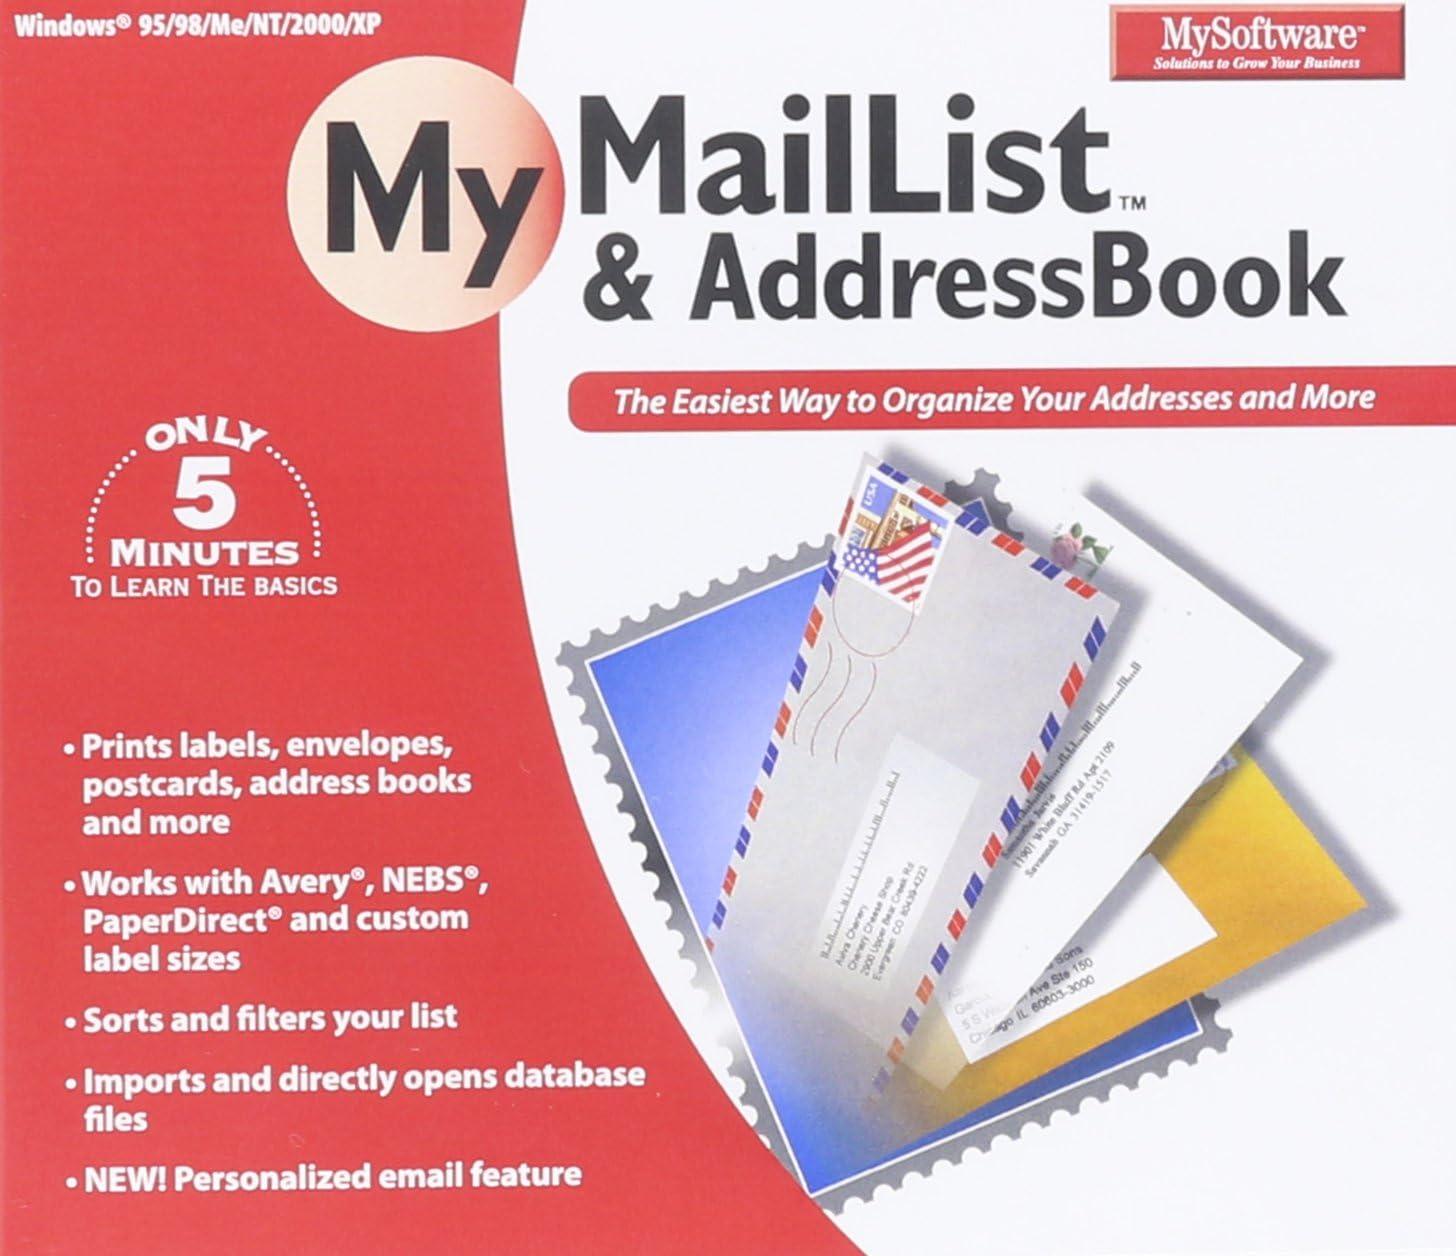 MySoftware shop Baltimore Mall Company My AddressBook MailList